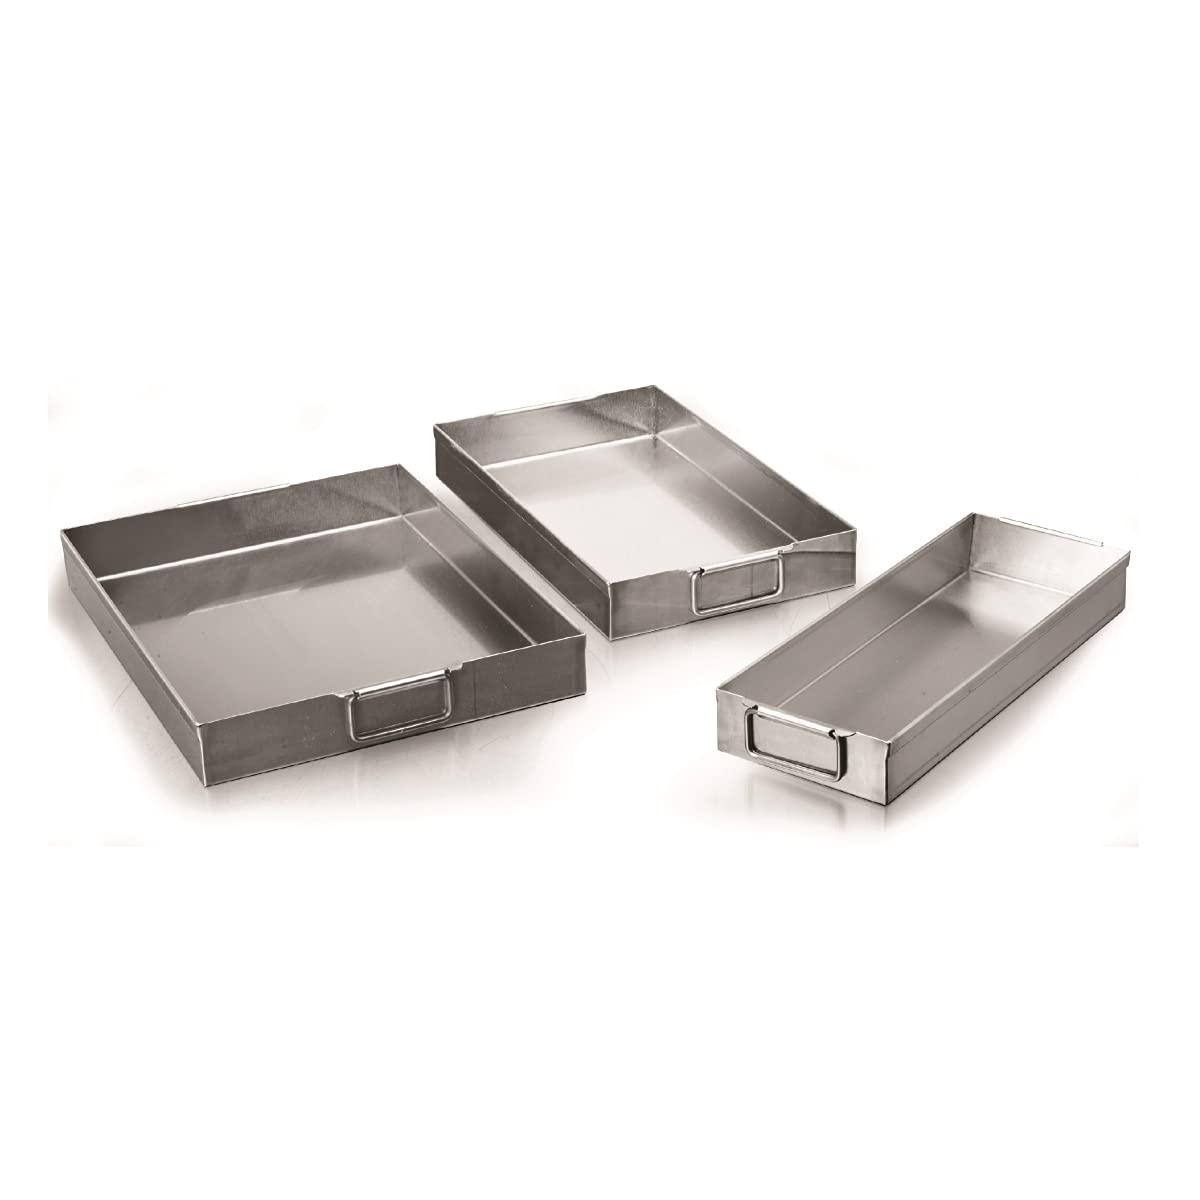 Update International SW0615 Stainless Steel Pan 6